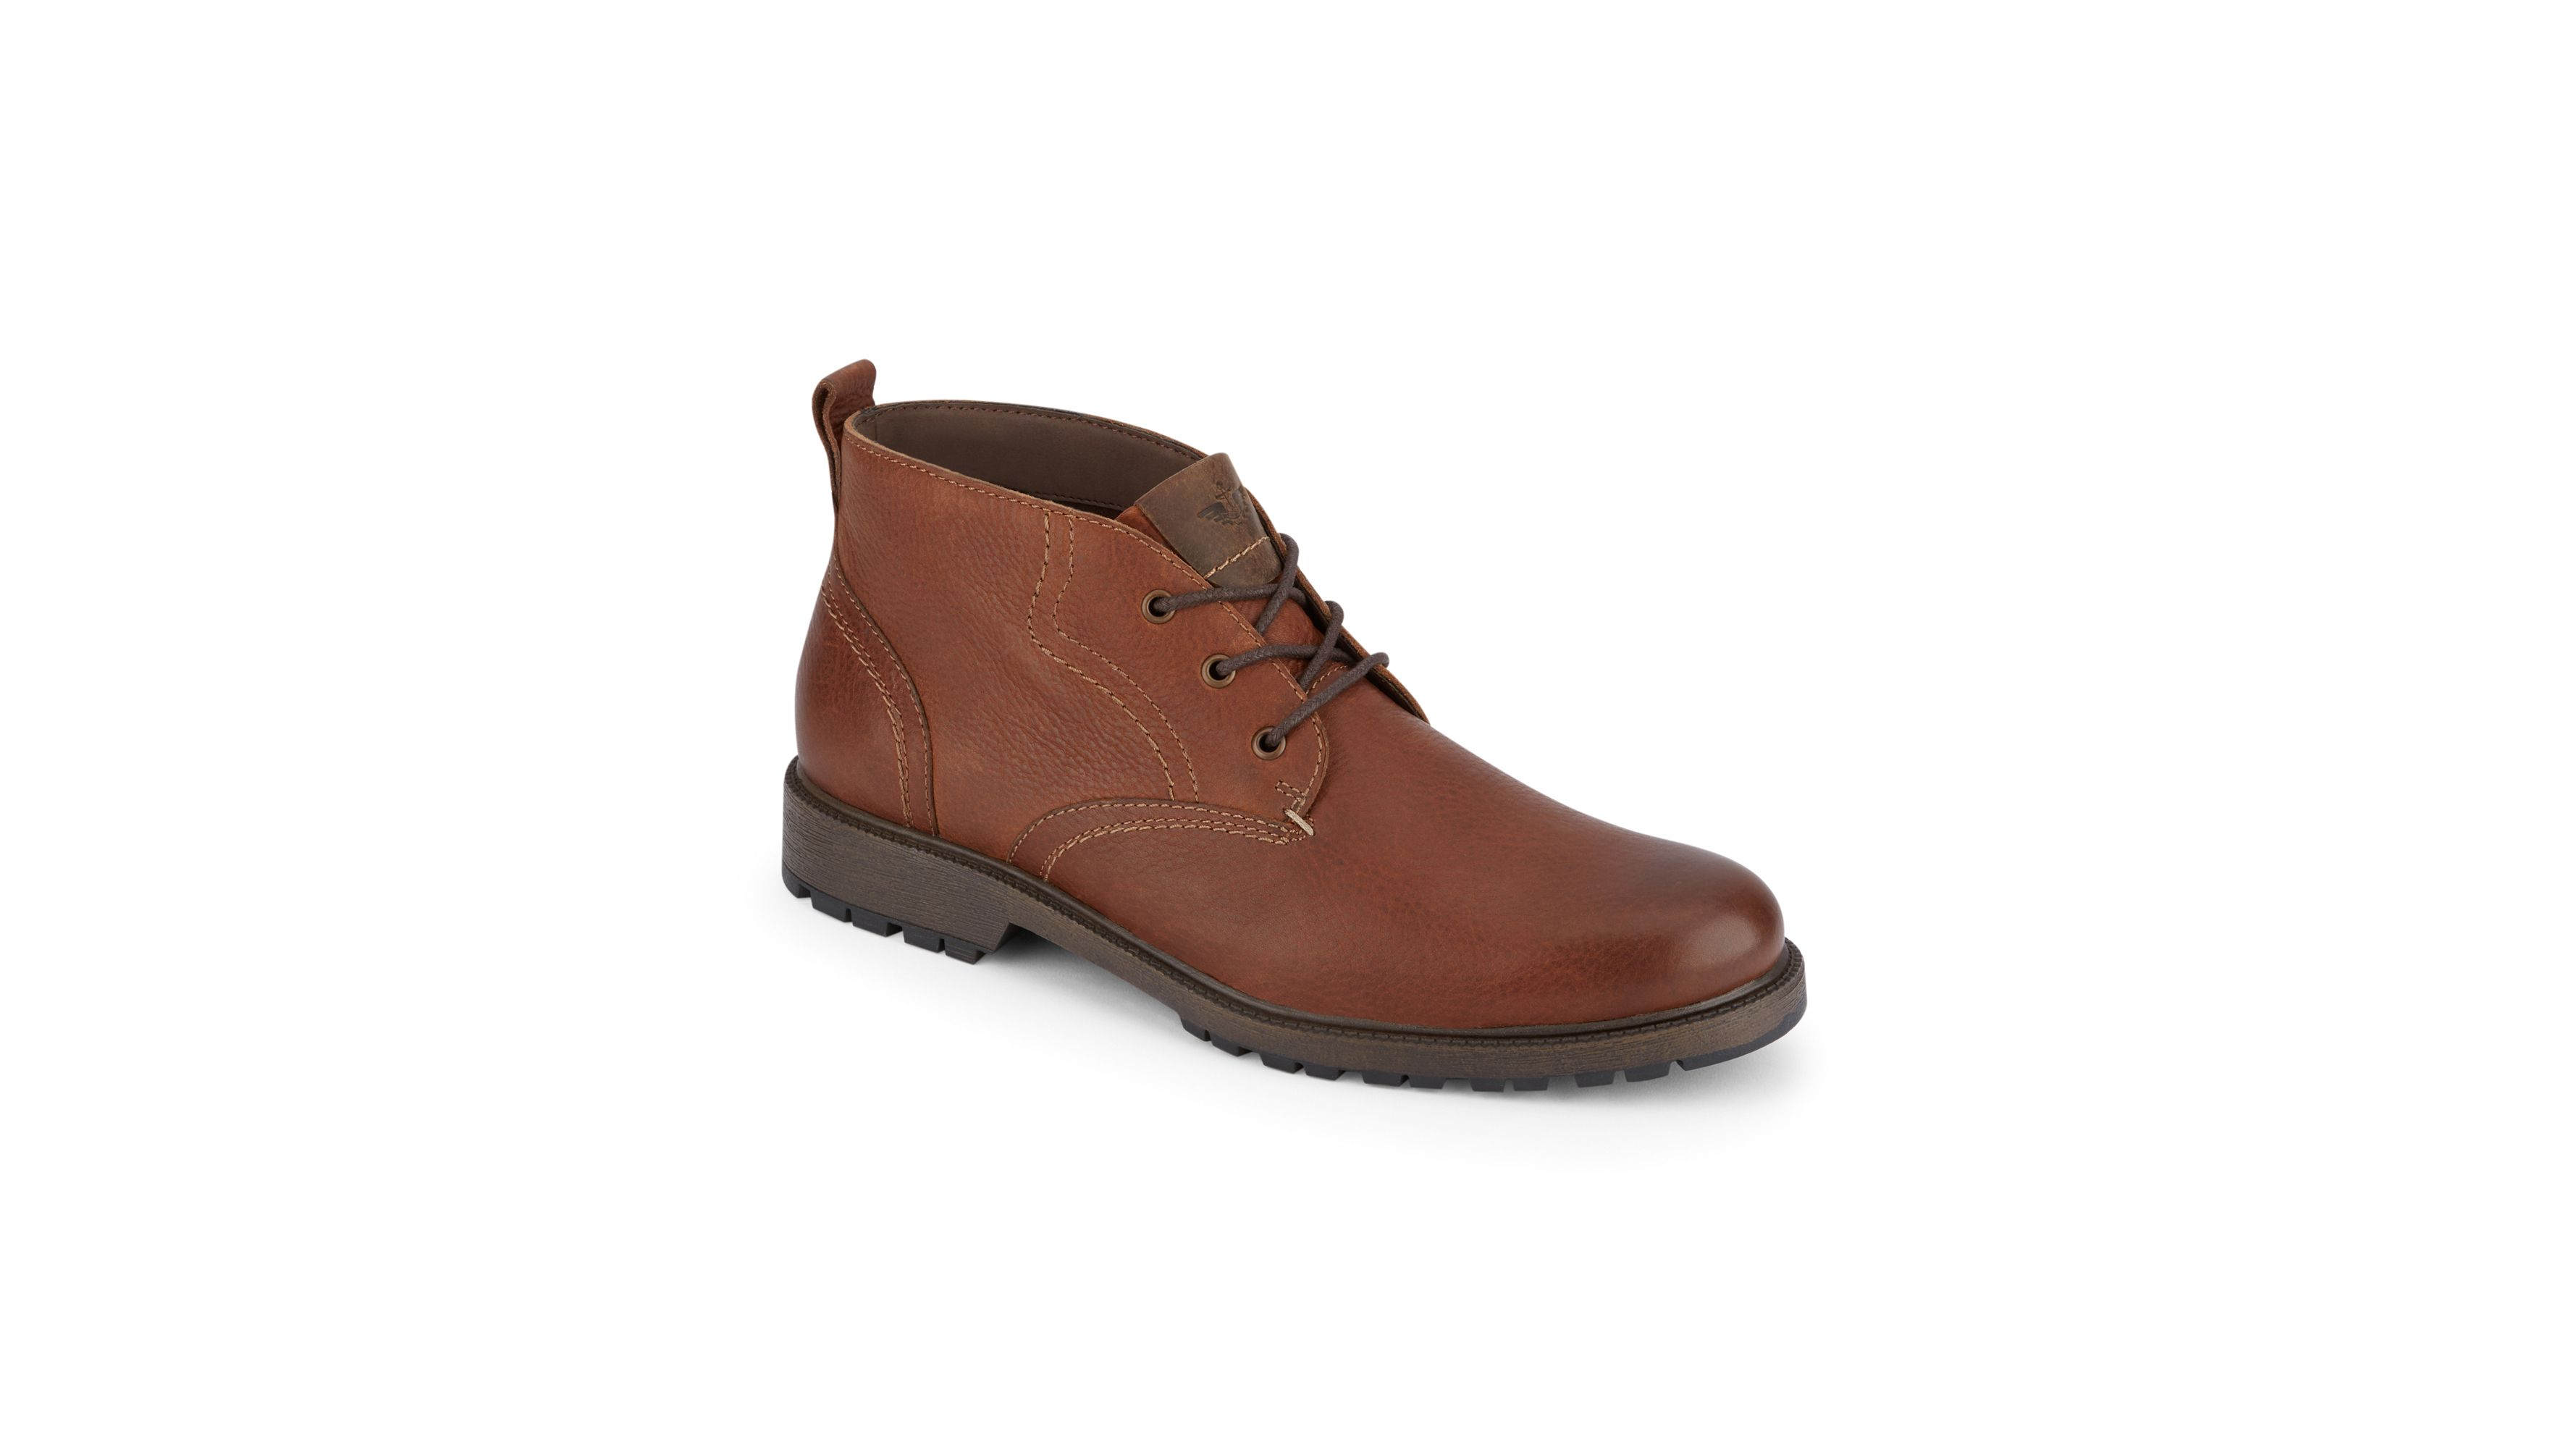 Men's Silas Waterproof Boots - Brown